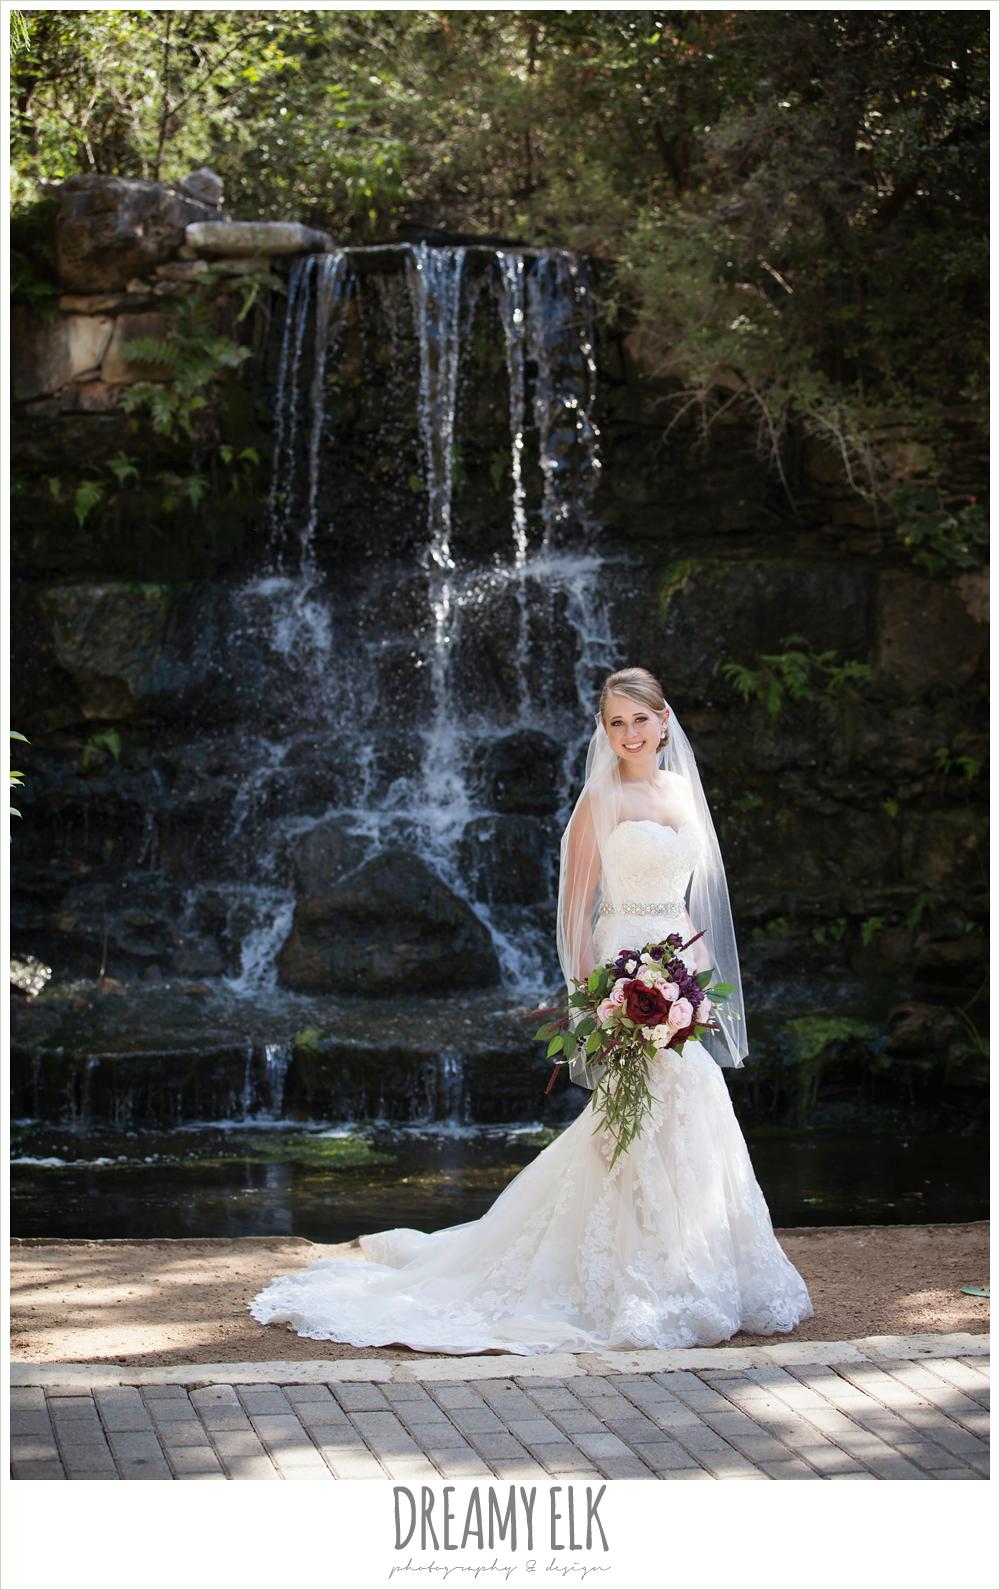 pink, burgundy, purple wedding bouquet, mermaid lace strapless wedding dress, summer outdoor bridal photos, zilker botanical gardens, austin, texas {dreamy elk photography and design}